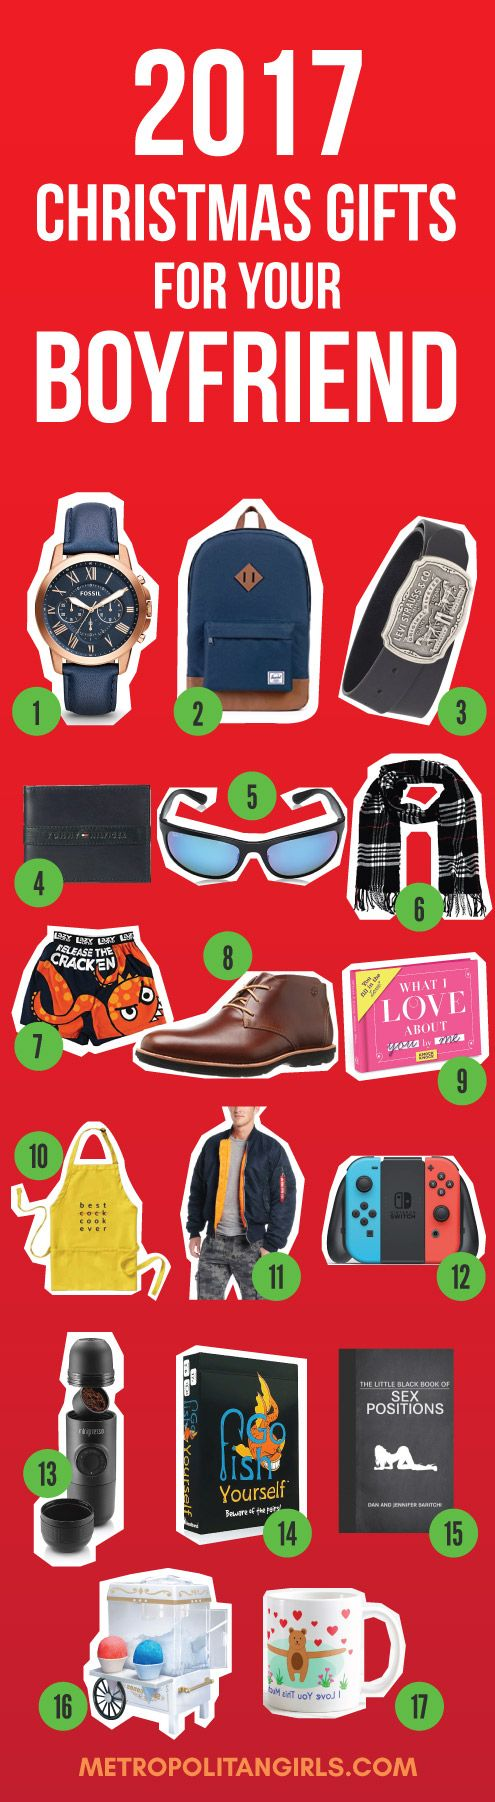 christmas gift ideas for new boyfriend 2017 giftsite co - Christmas Gifts For New Boyfriend